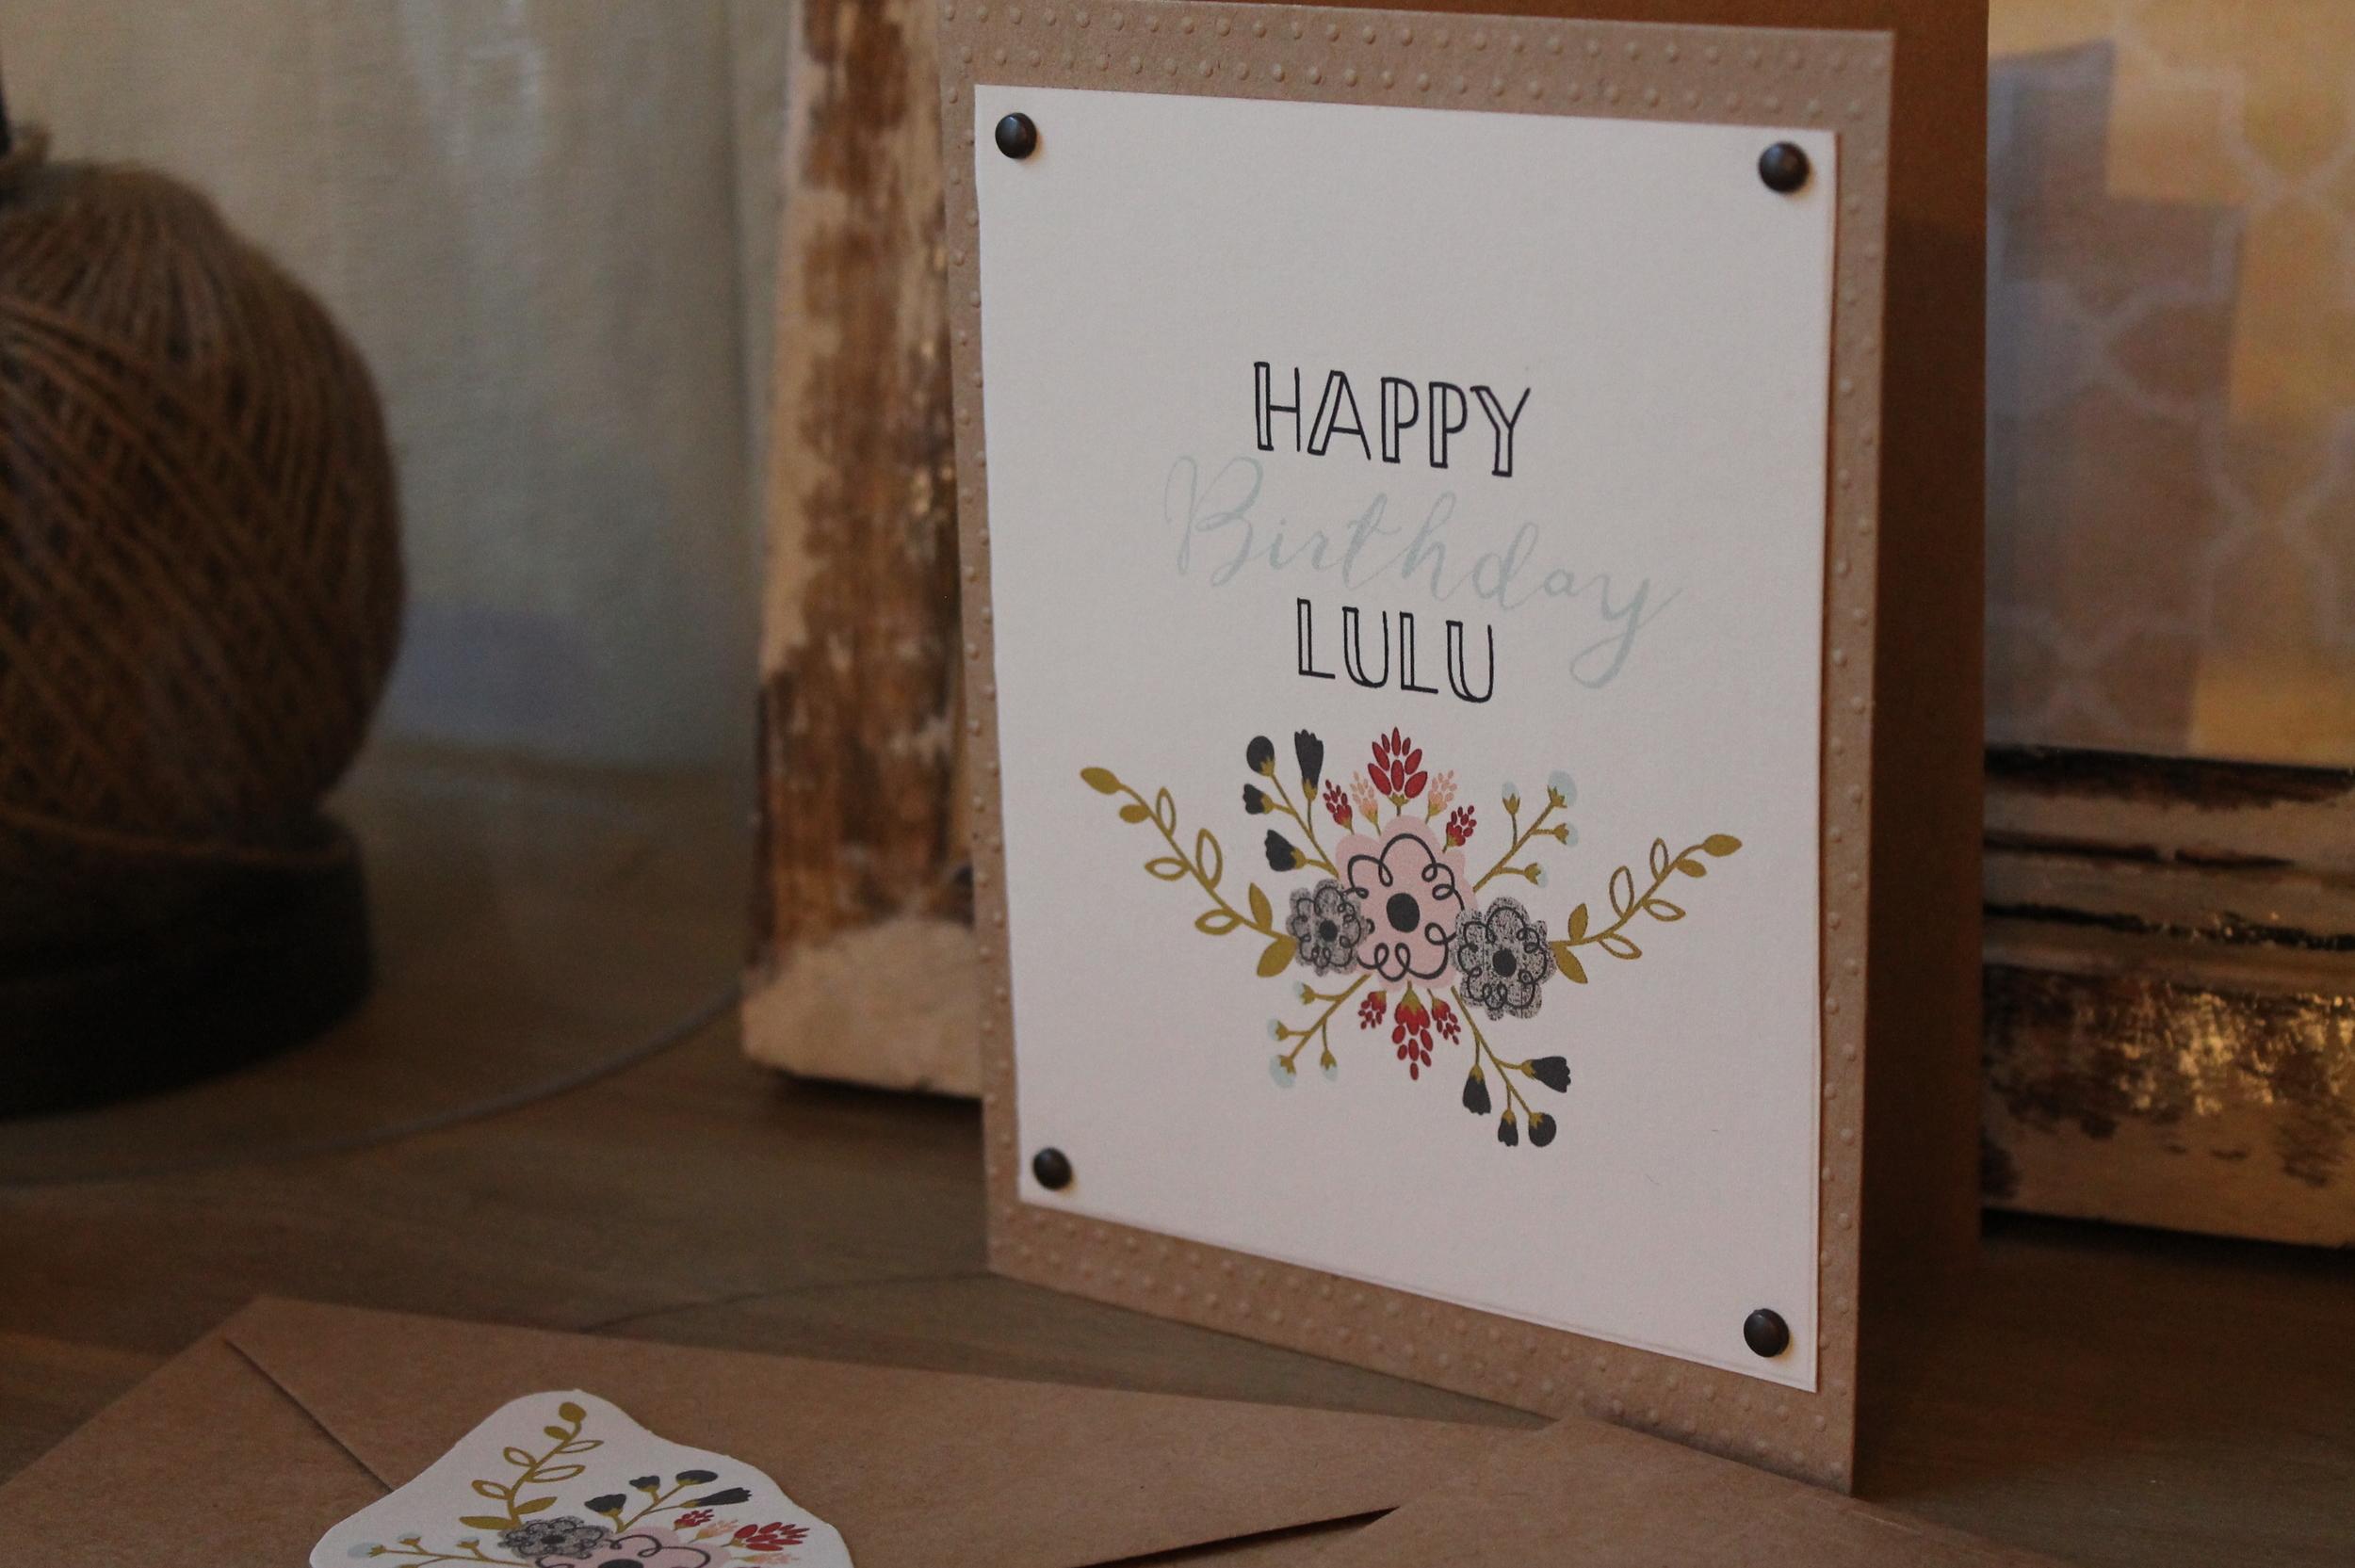 Personalized Birthday Card by Maritza Garcia.